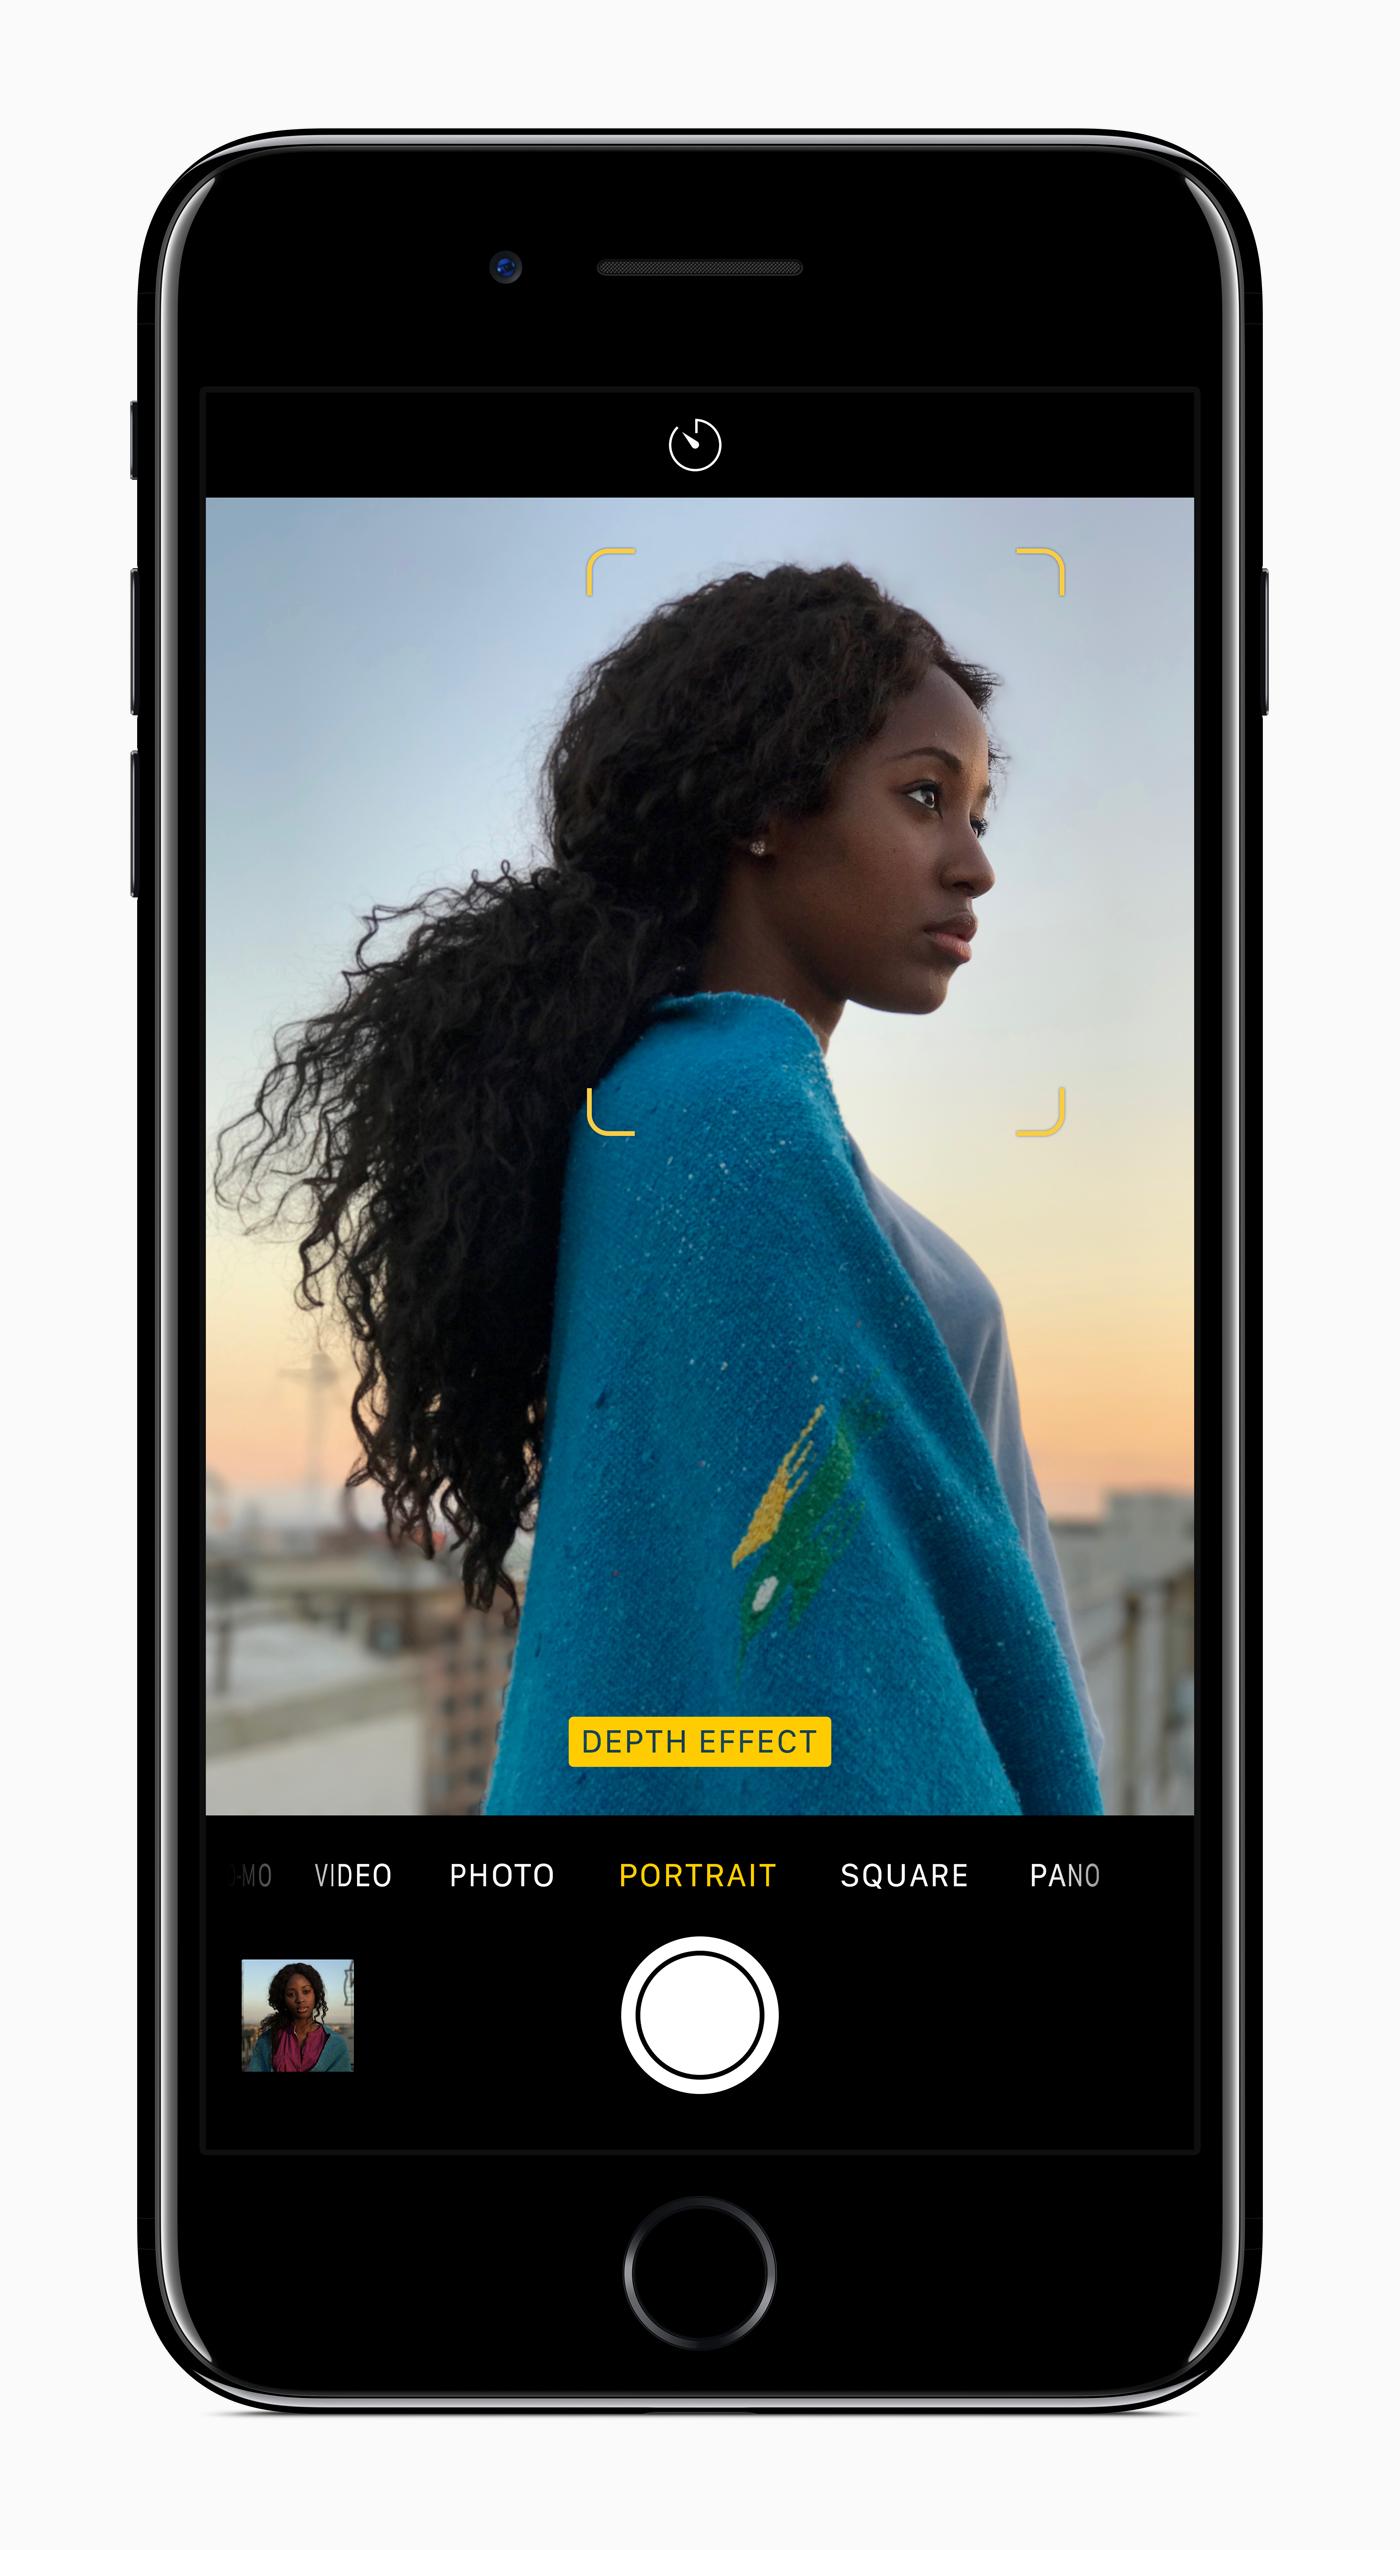 iPhone 7 Portrait Mode